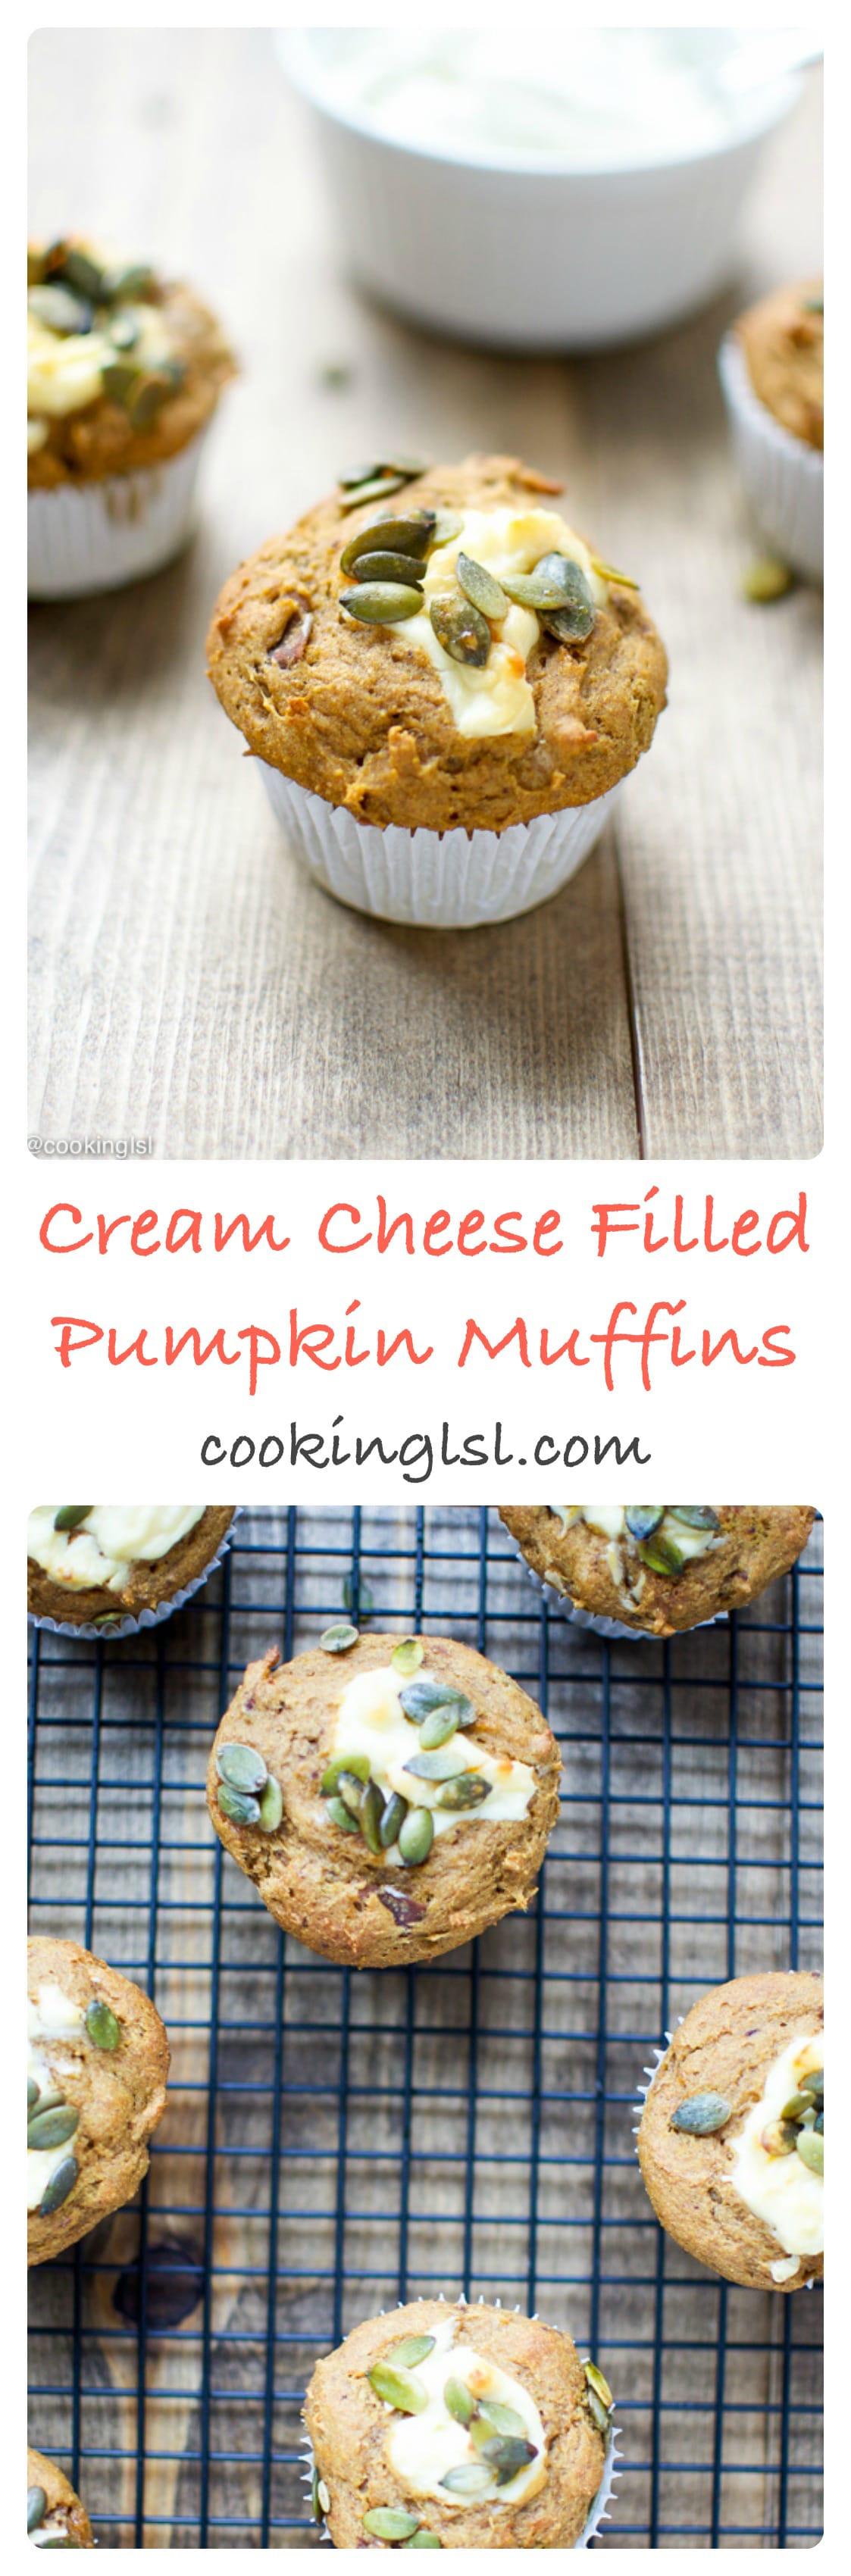 Cream-cheese-filled-pumpkin-muffins-naturally-sweetened